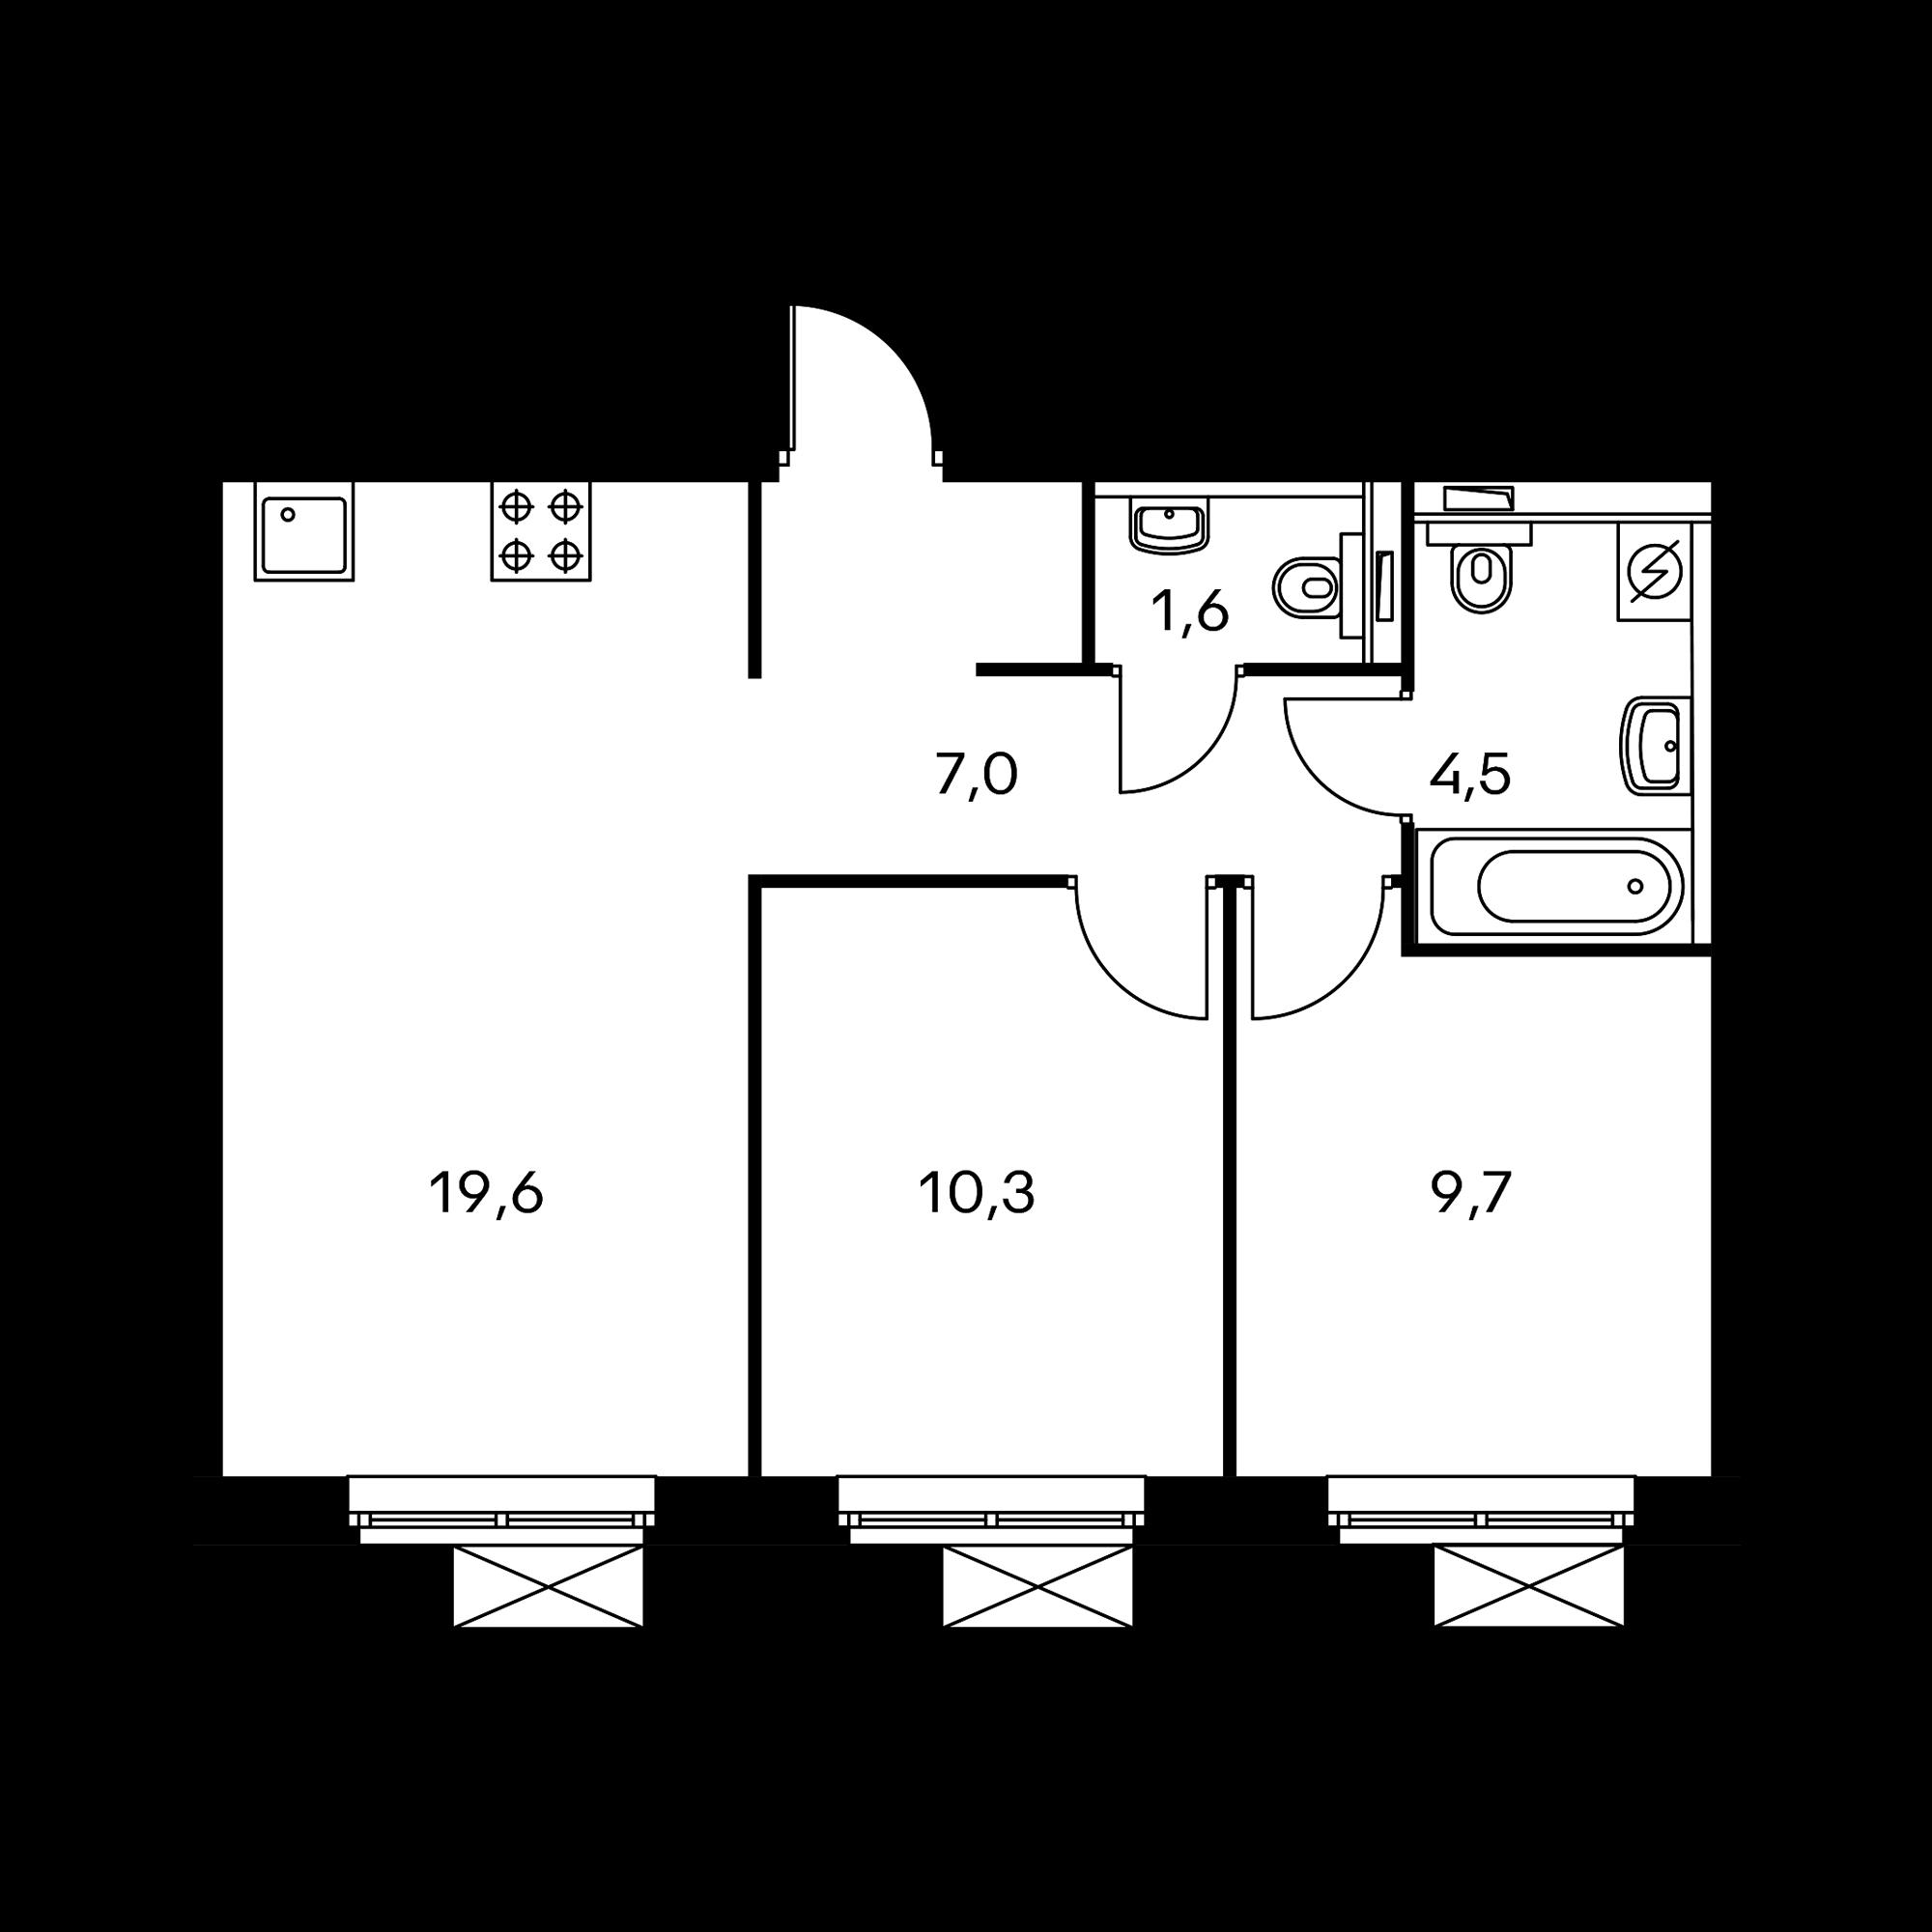 2ES9_9.3-1_S_Z